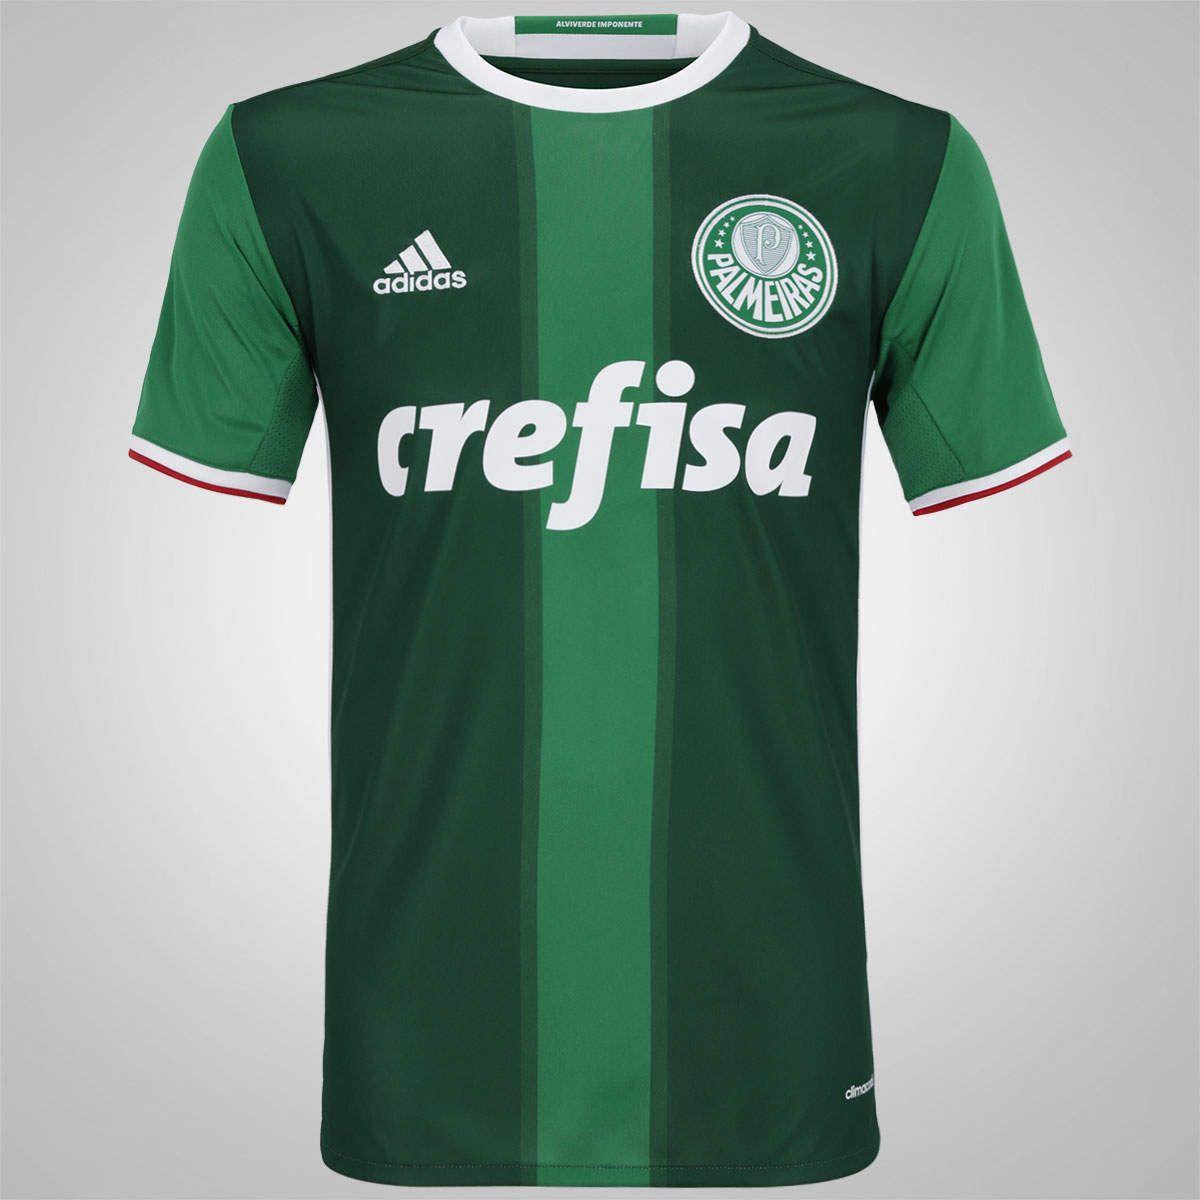 229831d503 Playeras De Futbol, Escudo, Imprimir, Capas, Equipos De Fútbol, Camisetas De